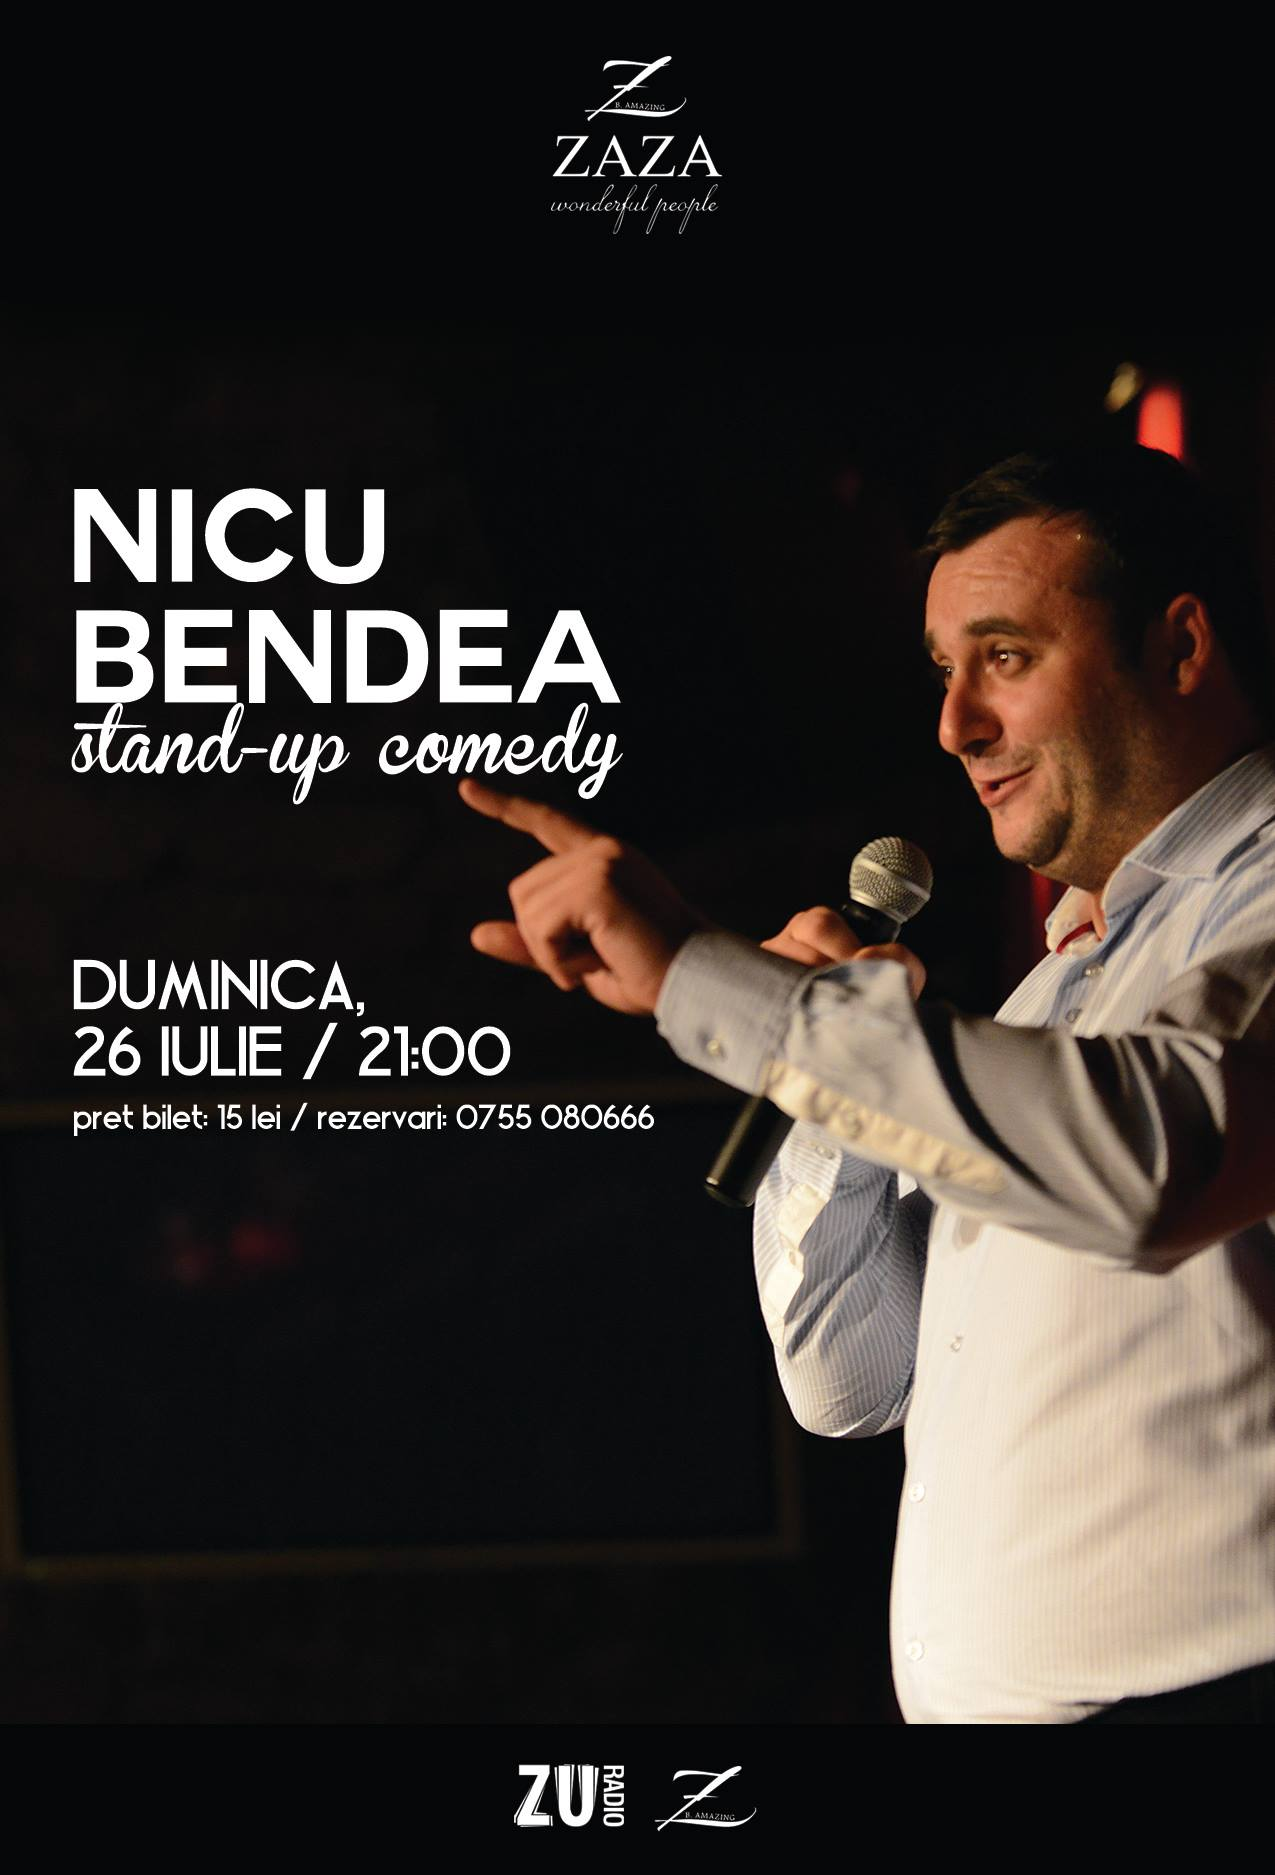 Nicu Bendea @ Zaza Cafe